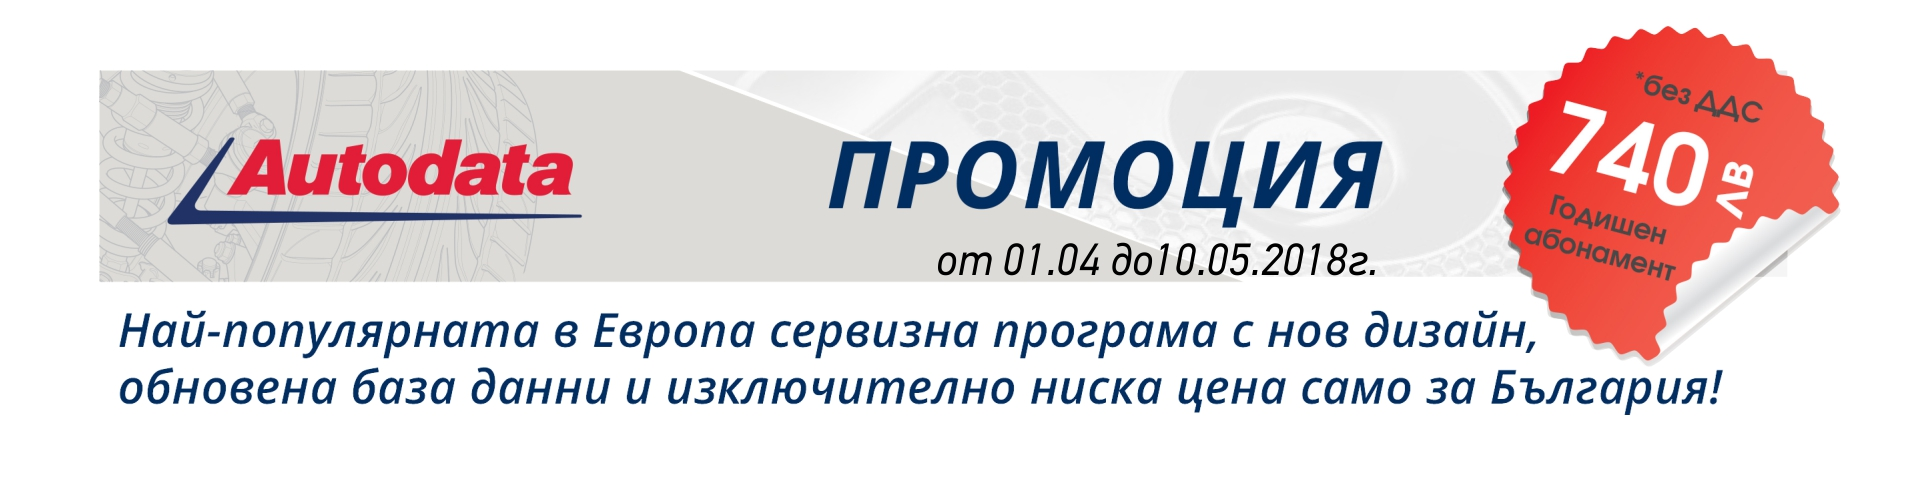 promo_autodata_banner.jpg